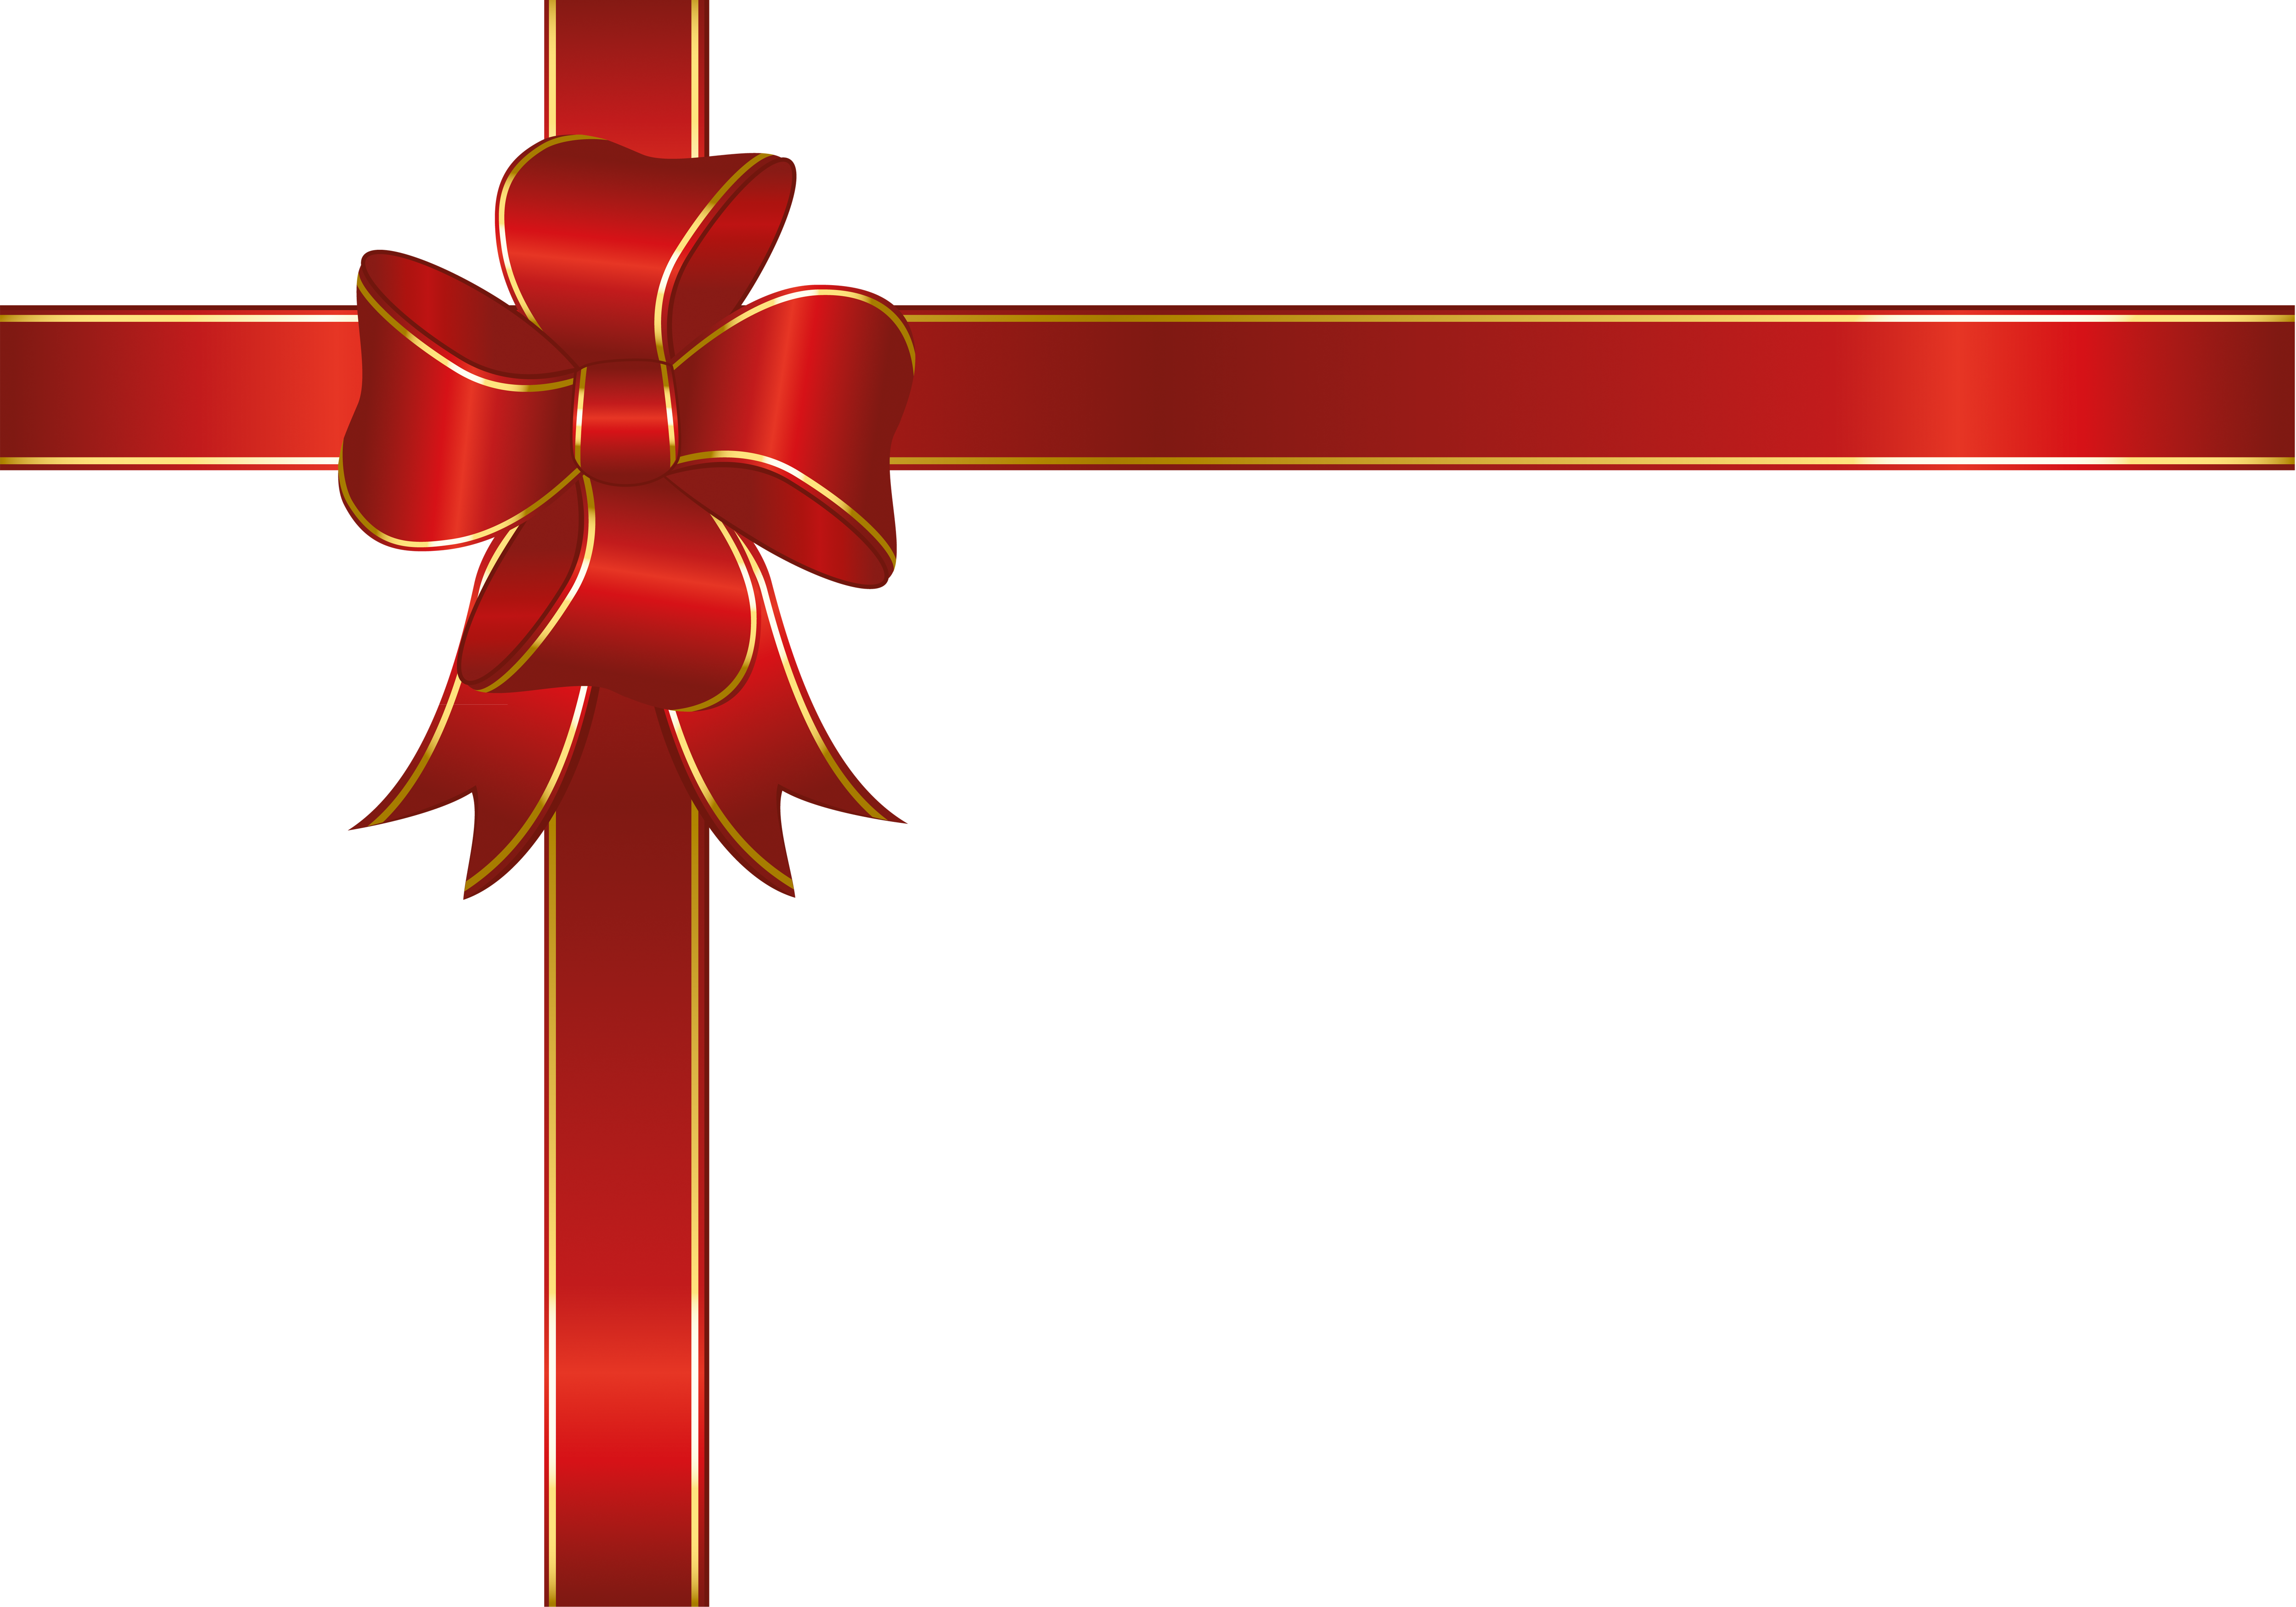 Christmas ribbon border clipart vector library library Ribbon HF MUSIC STUDIO 9th - Creative Christmas bow,Red ribbon bow ... vector library library